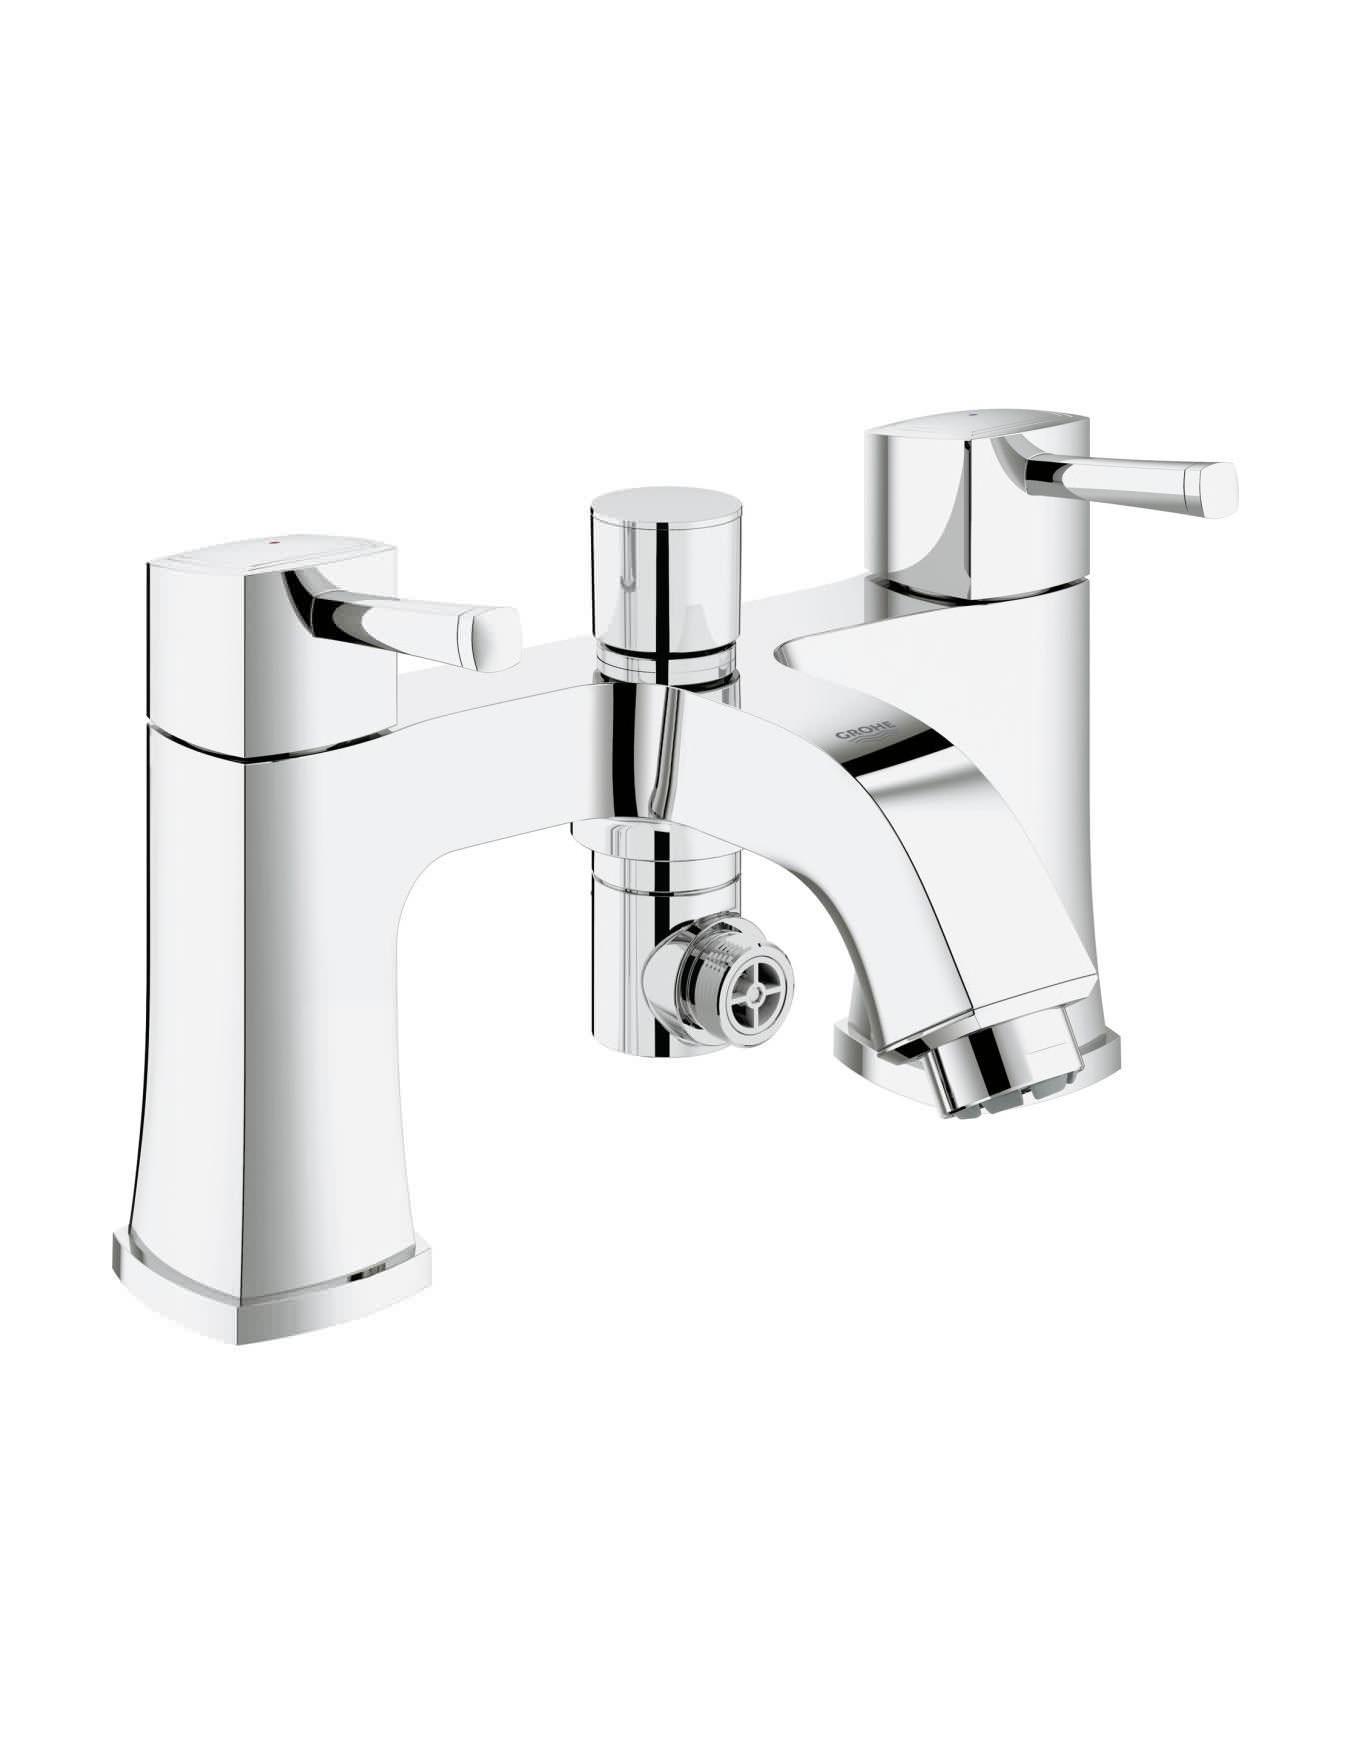 grohe spa grandera two handled bath shower mixer tap. Black Bedroom Furniture Sets. Home Design Ideas